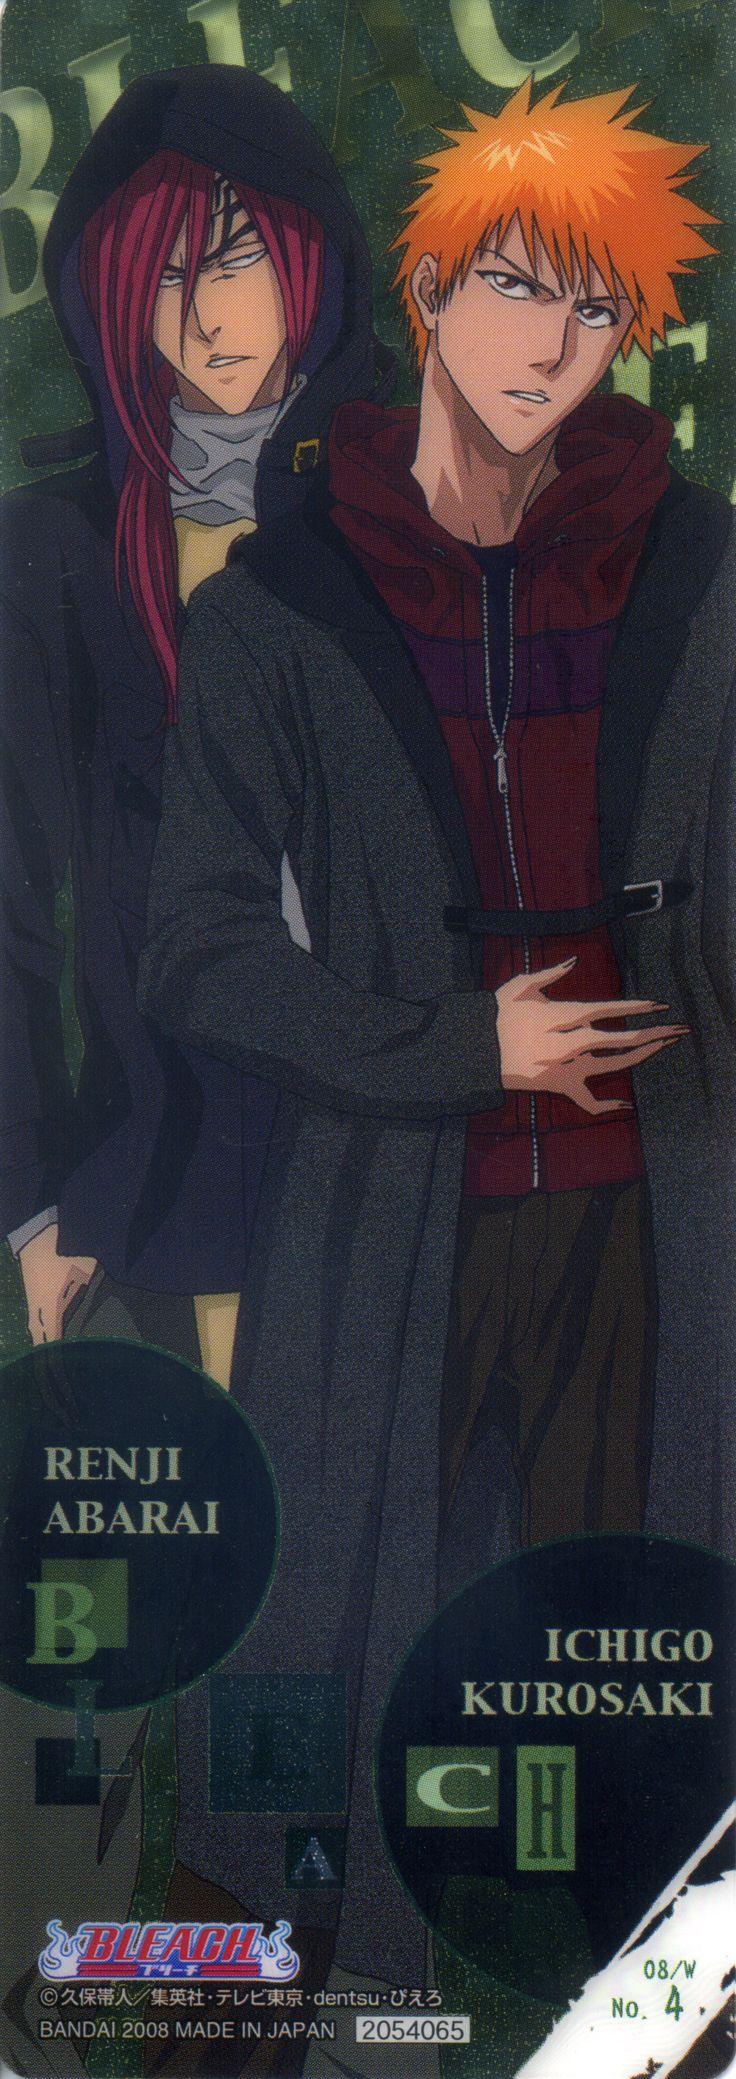 Studio Pierrot, Bleach, Renji Abarai, Ichigo Kurosaki, Stick Poster